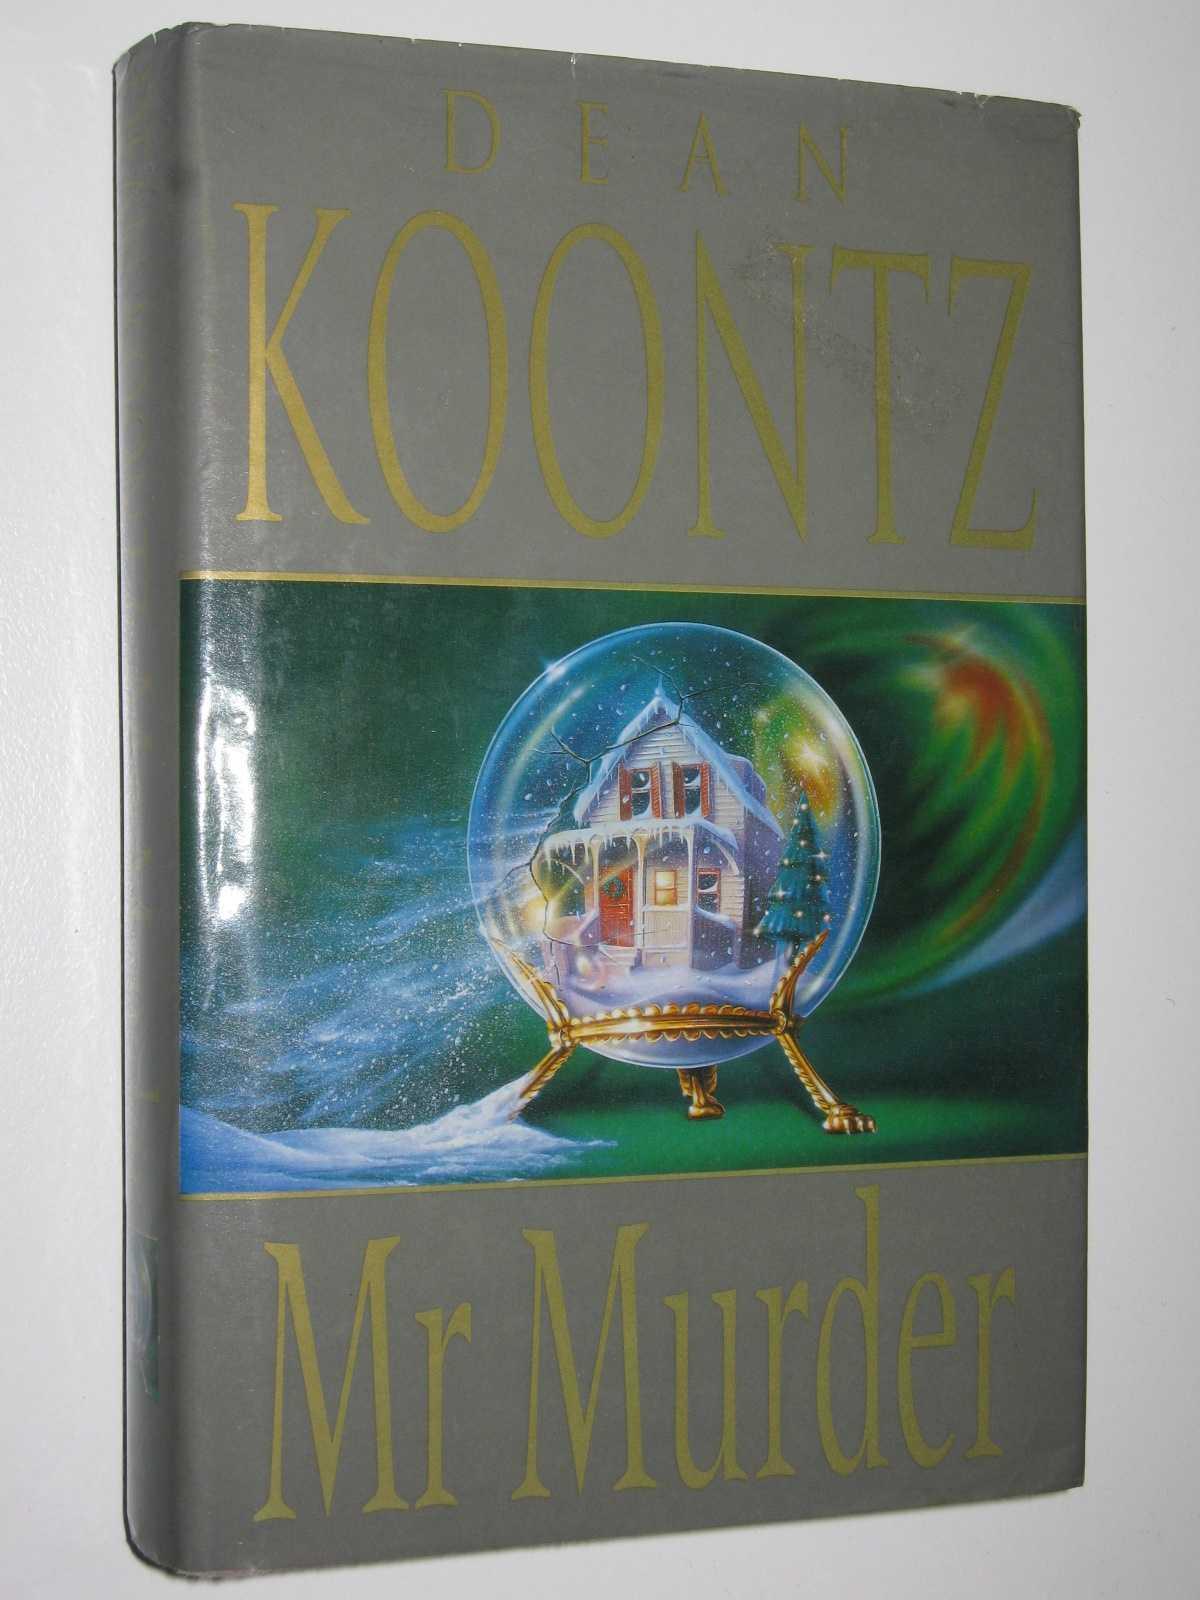 Mr Murder, Koontz, Dean